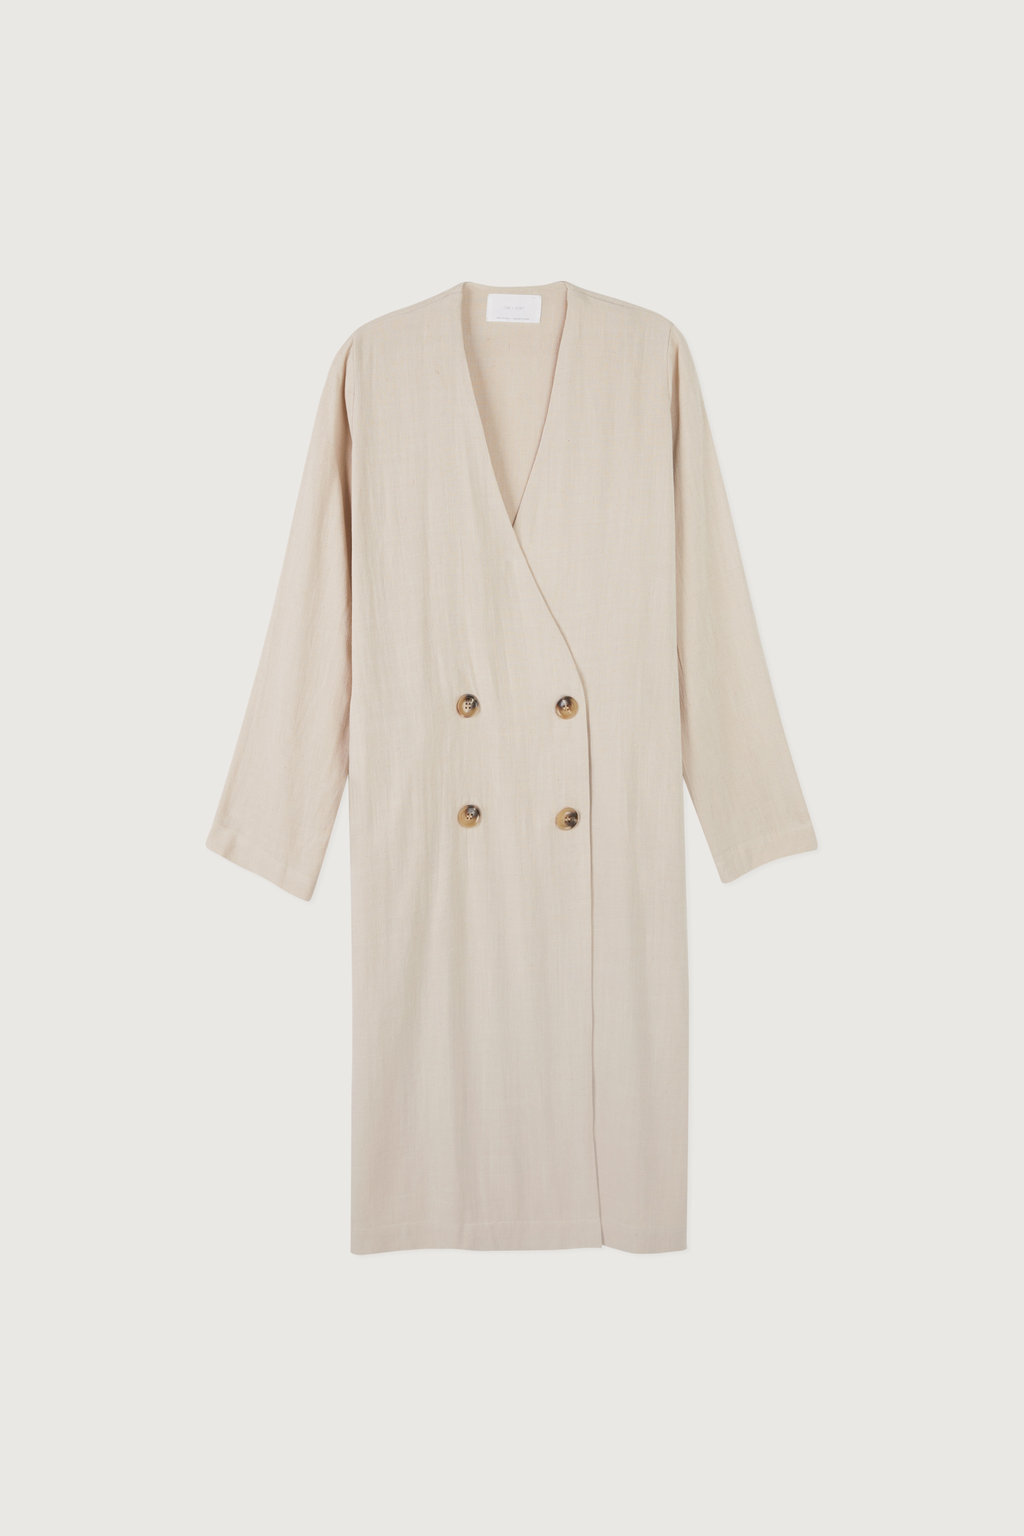 Coat 3170 Oatmeal 5